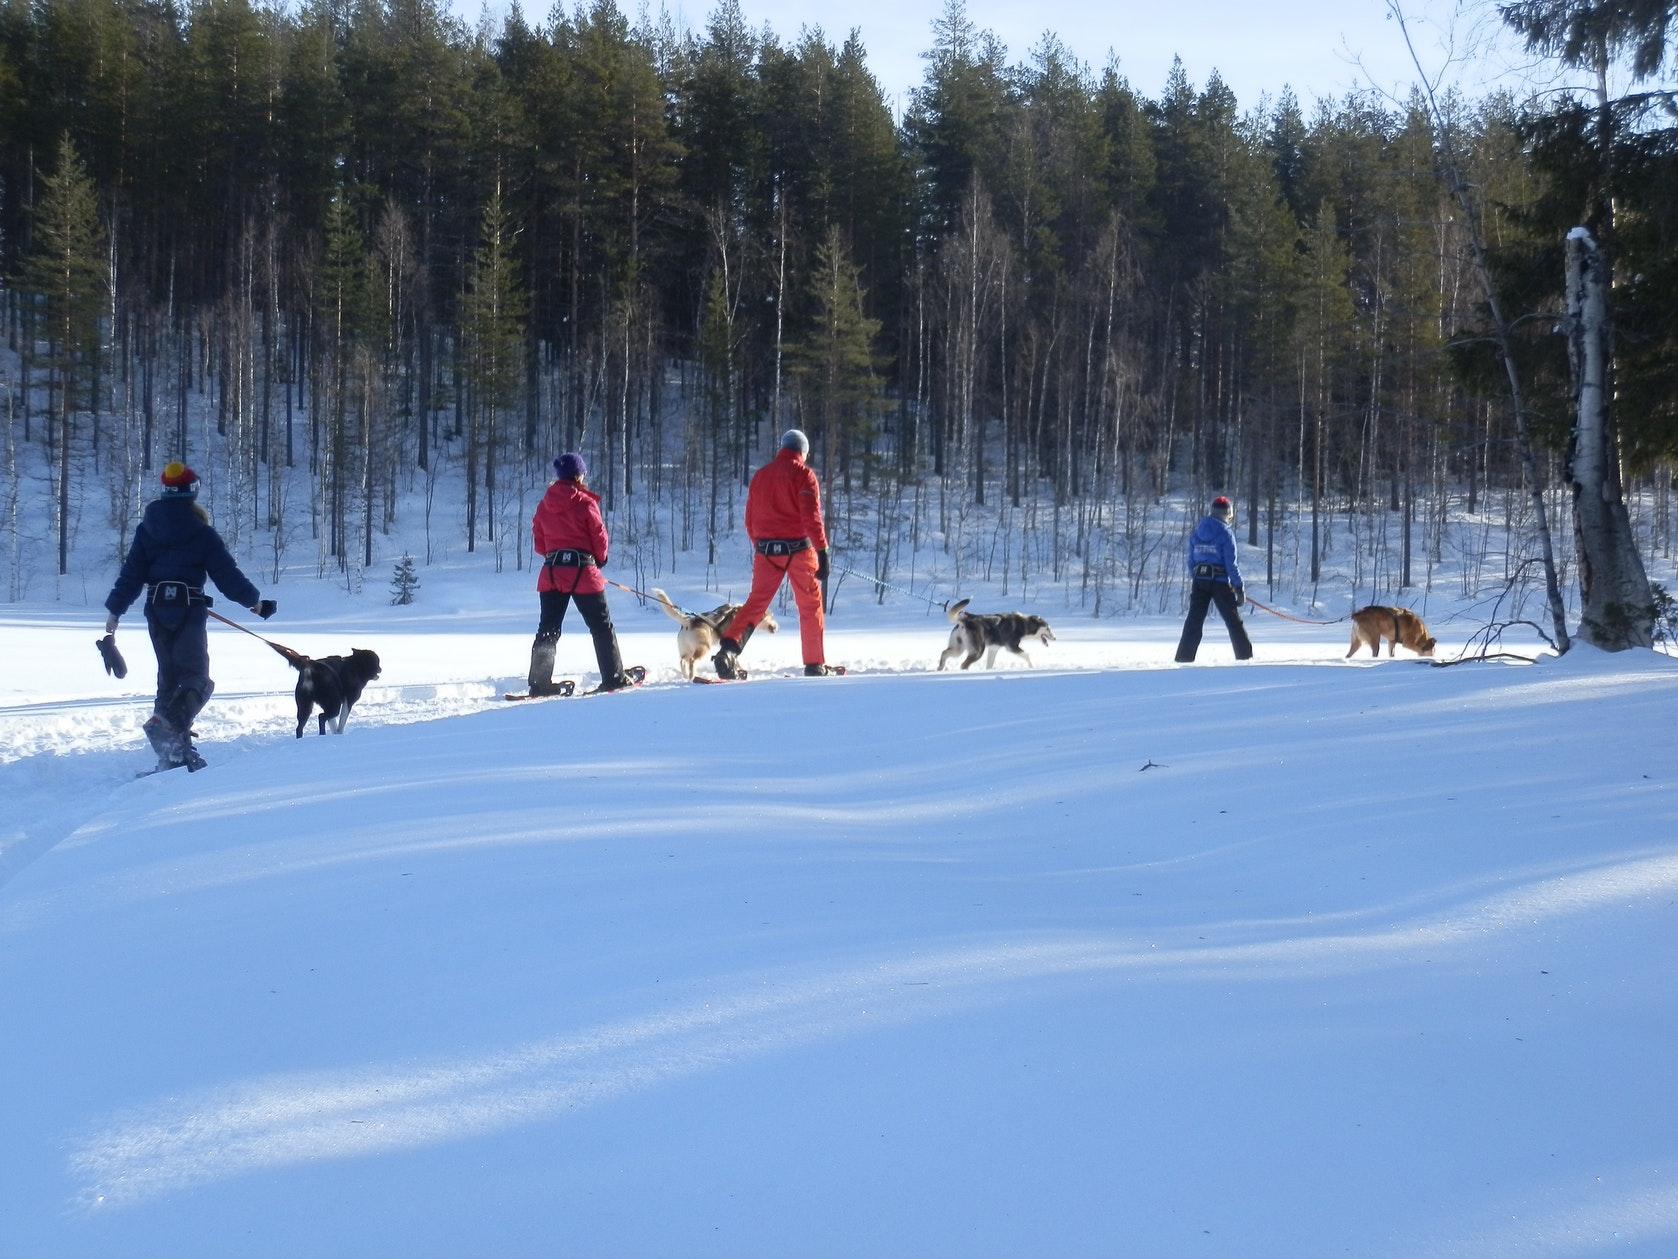 wintertour_huskysnowshoewalk_1